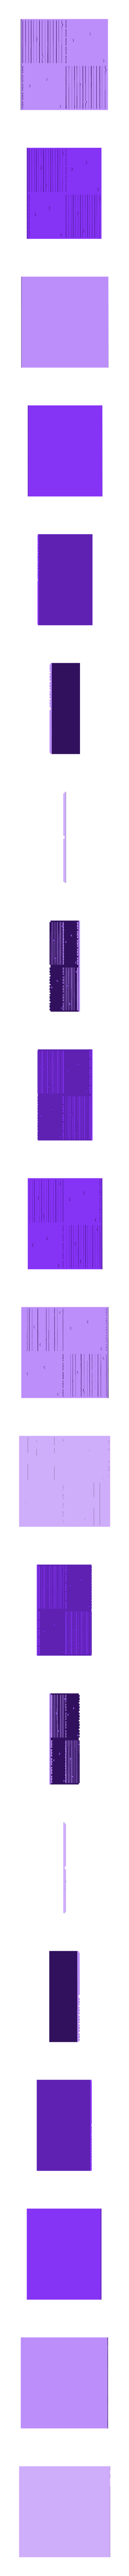 2X2_minimal_wood_floor.stl Download free STL file Minimalist Flooring • 3D printer template, mrhers2